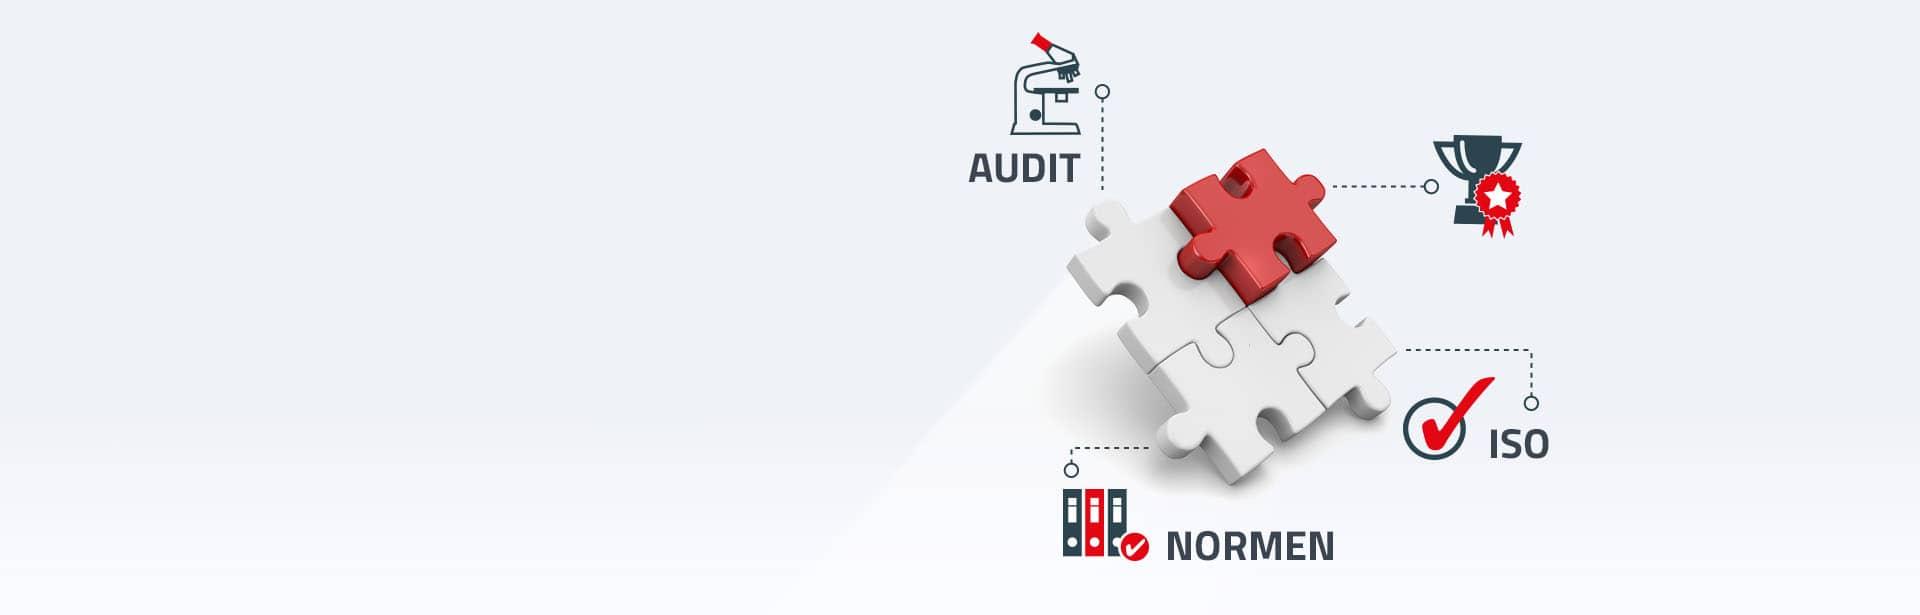 zertifizierung ISO 9001, Audit